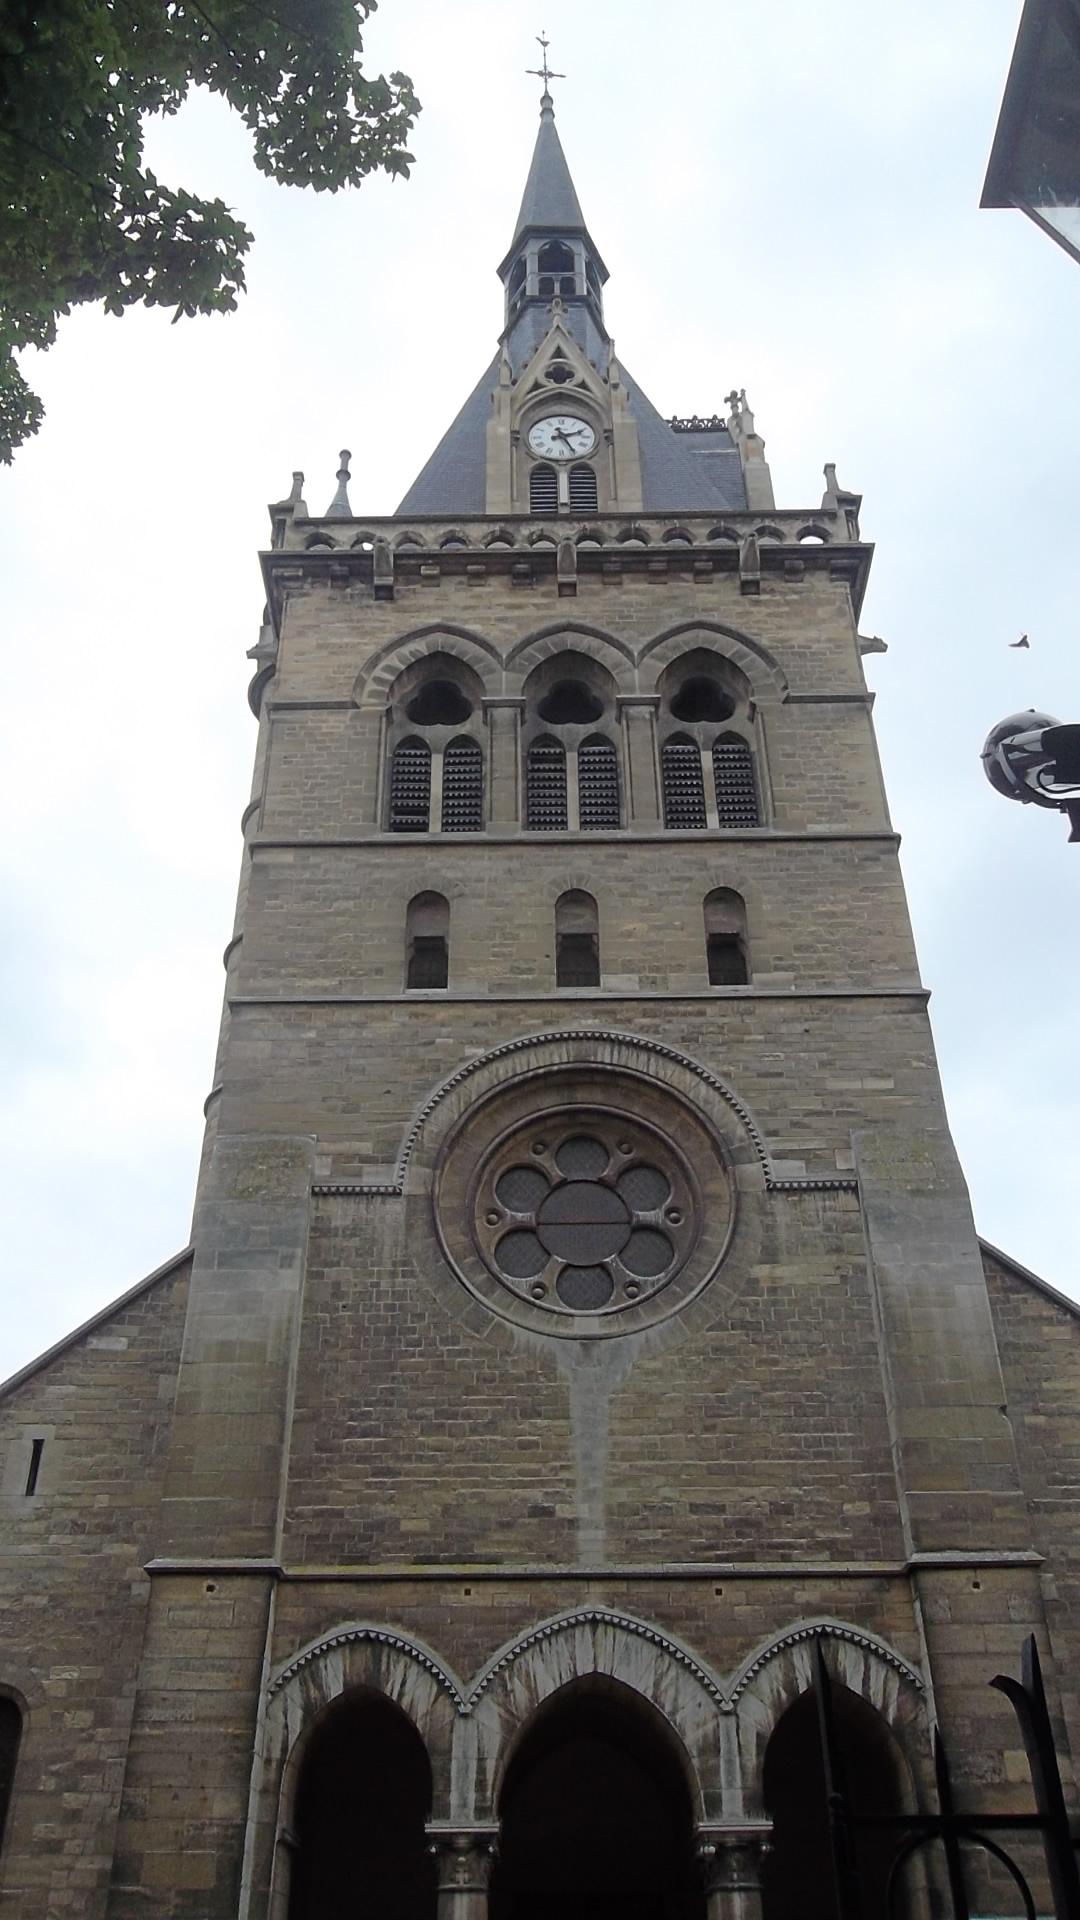 maisons-laffitte-tower-of-ch-st-nicolas-jun12